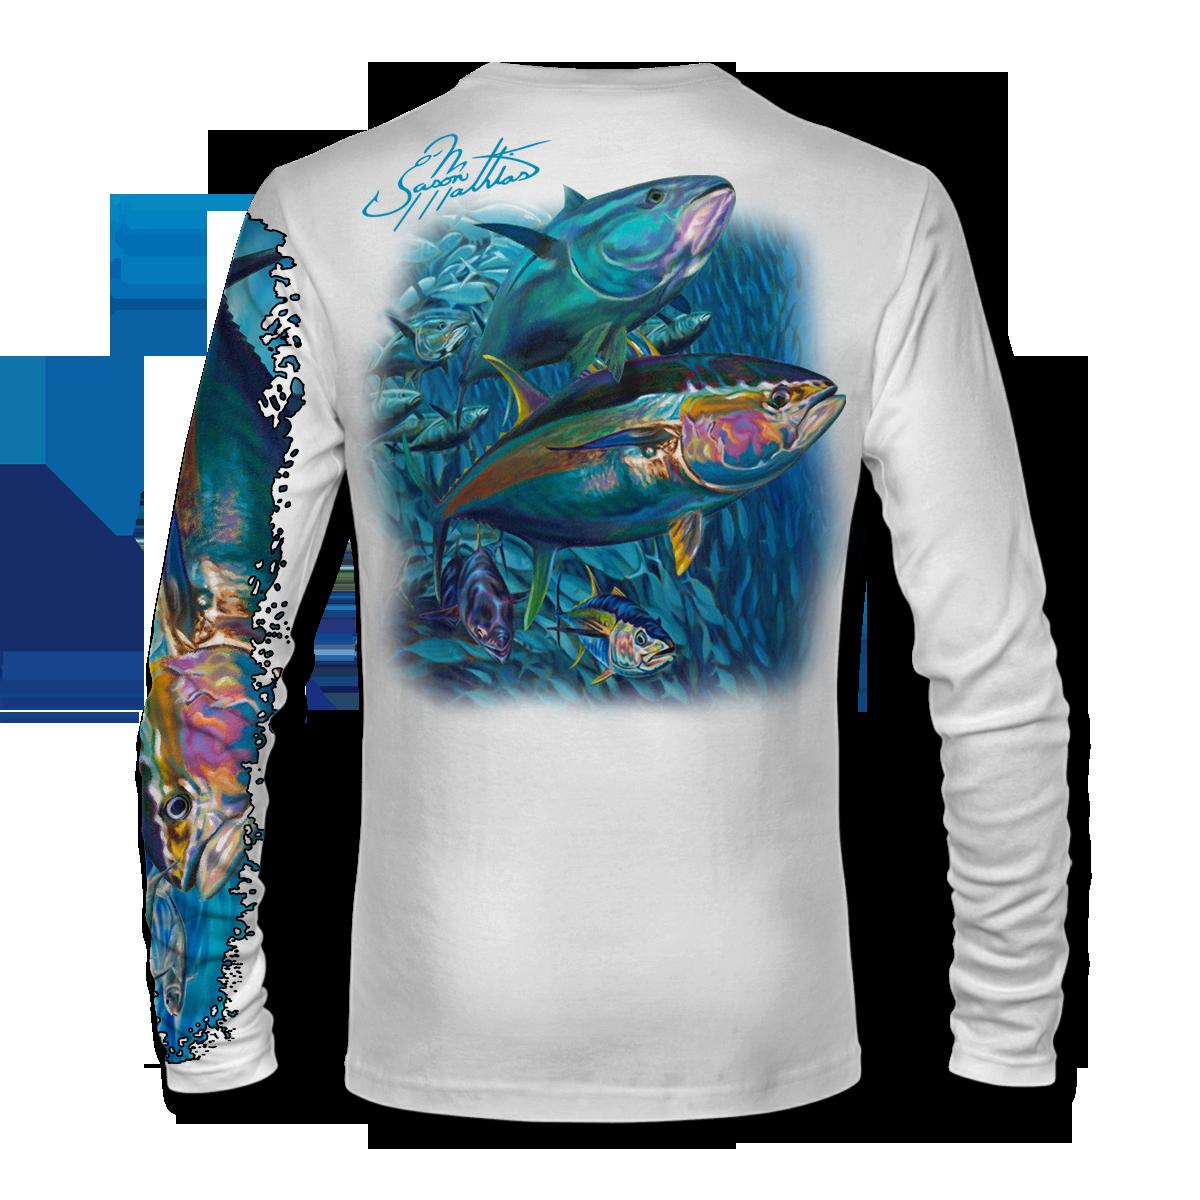 jason-mathias-tee-shirt-back-yellowfin-tuna-performance.png